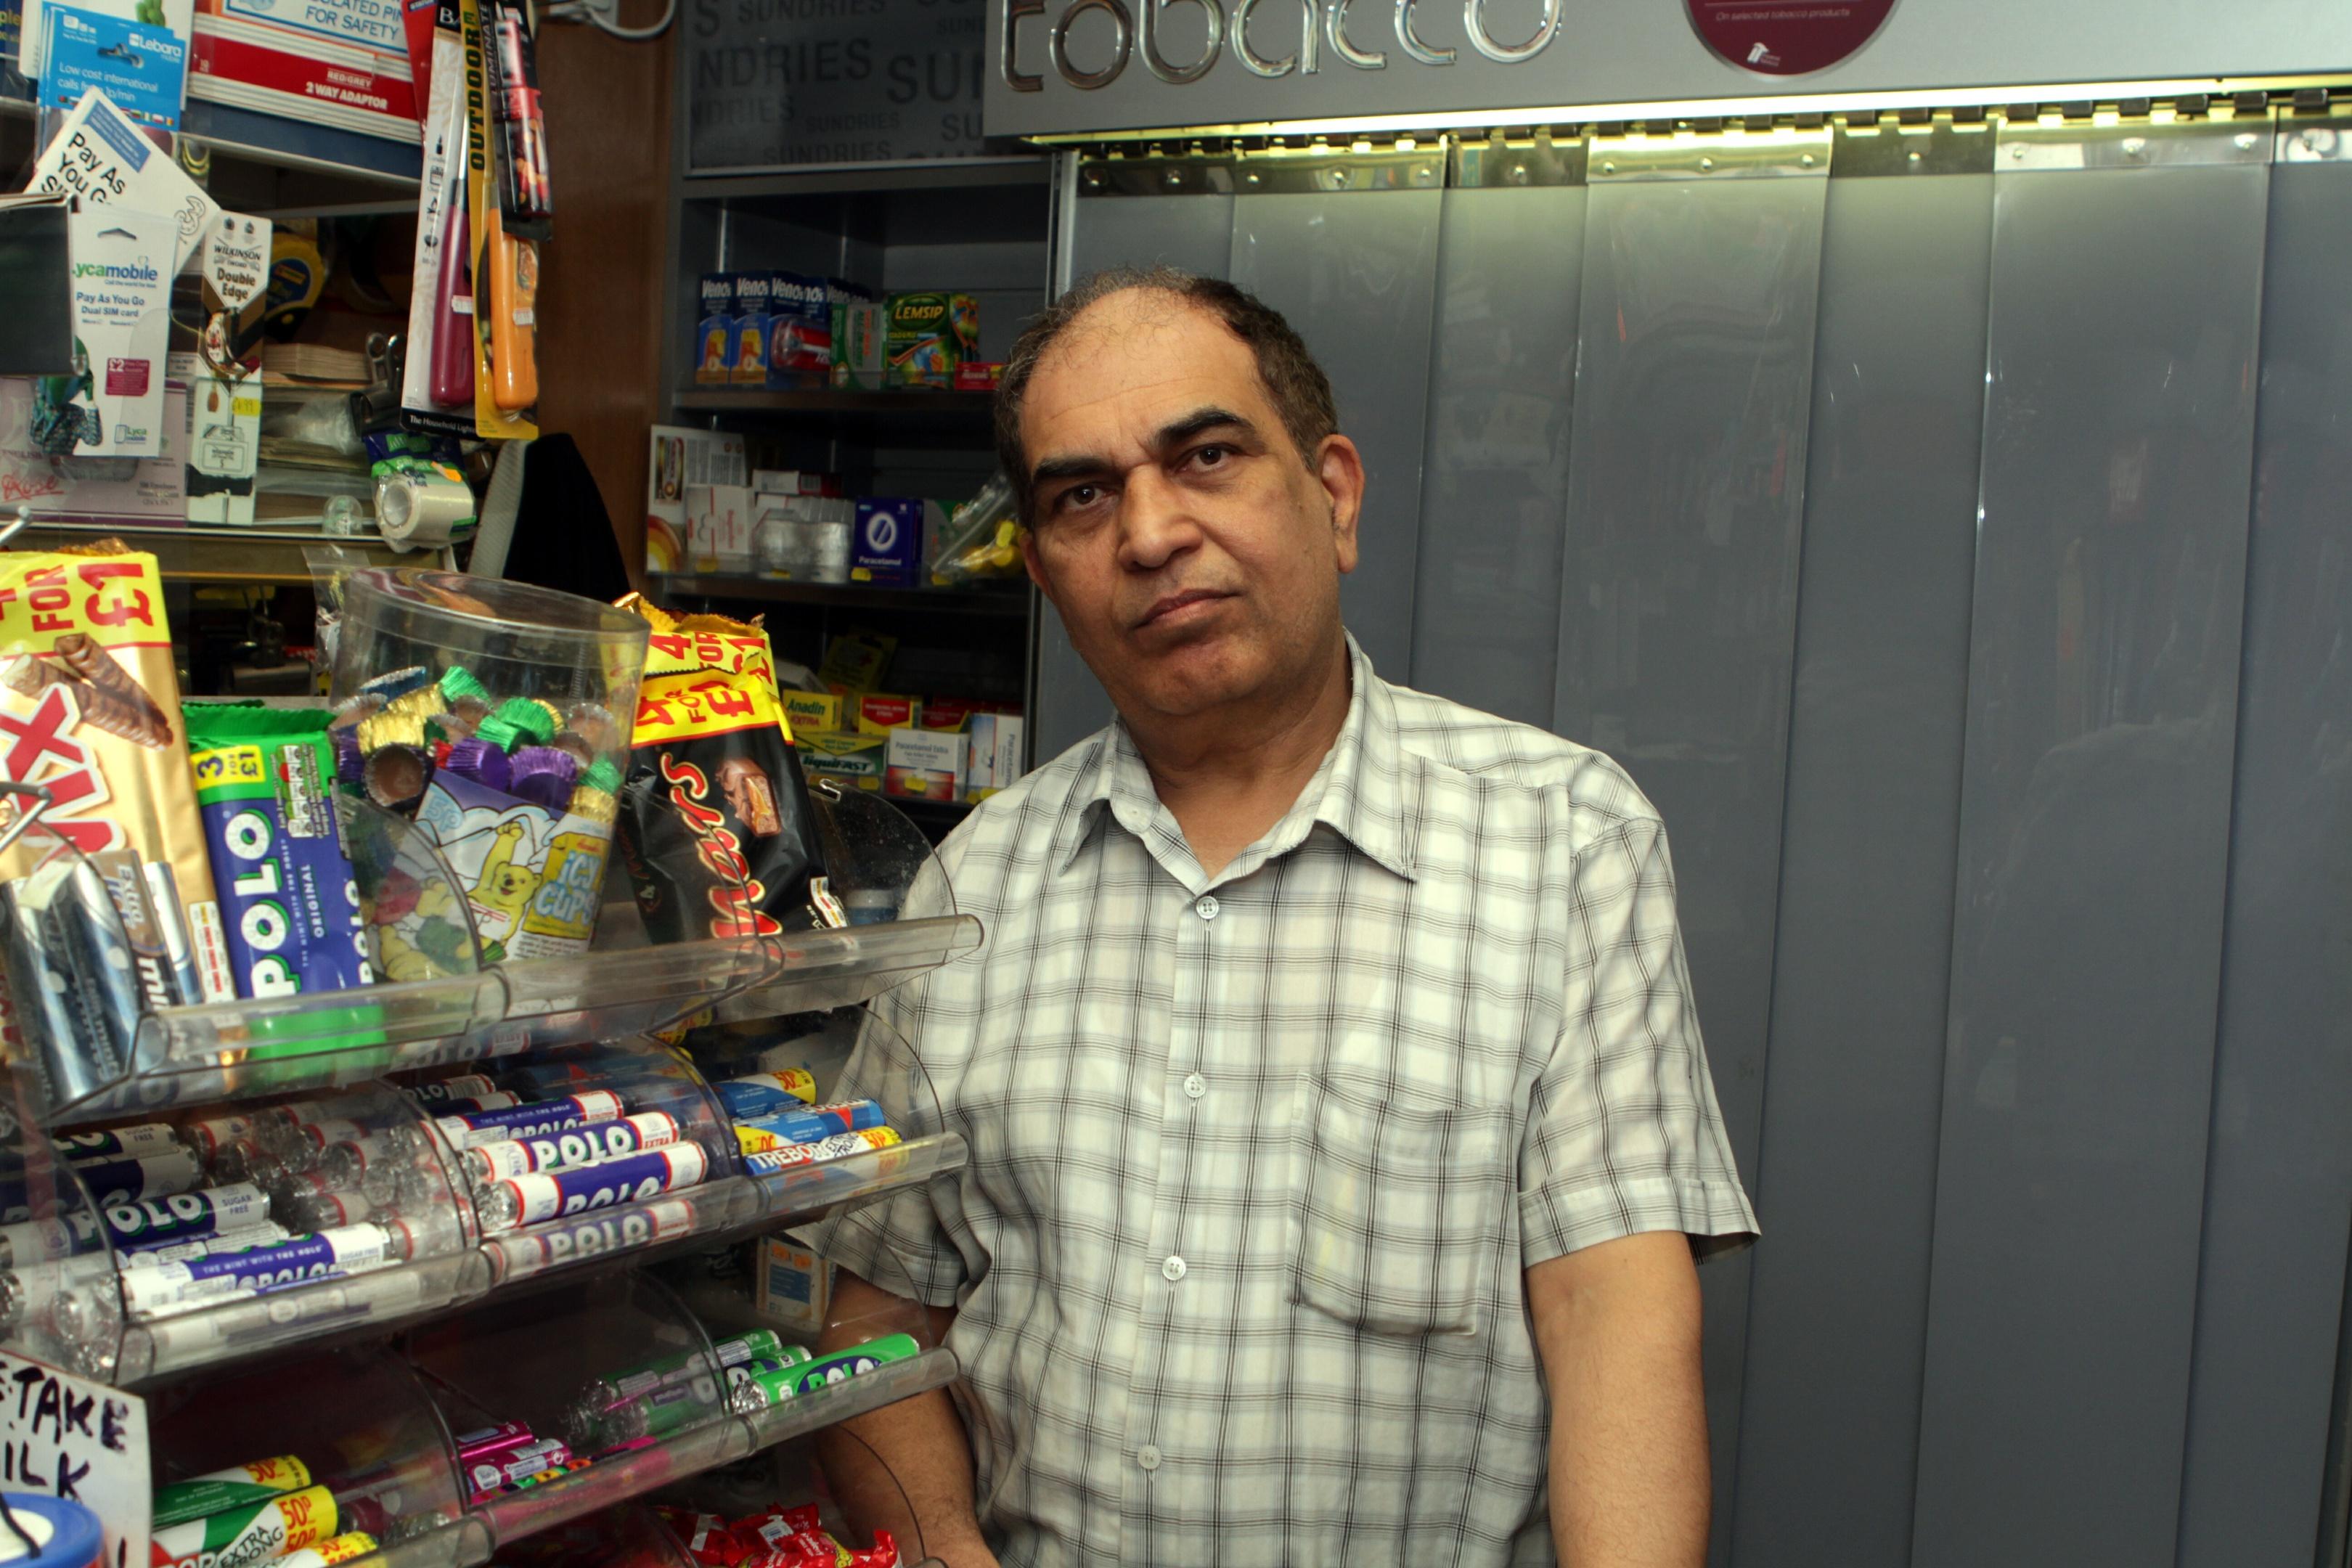 Mohammed Saleem following Saturday morning's shocking incident.